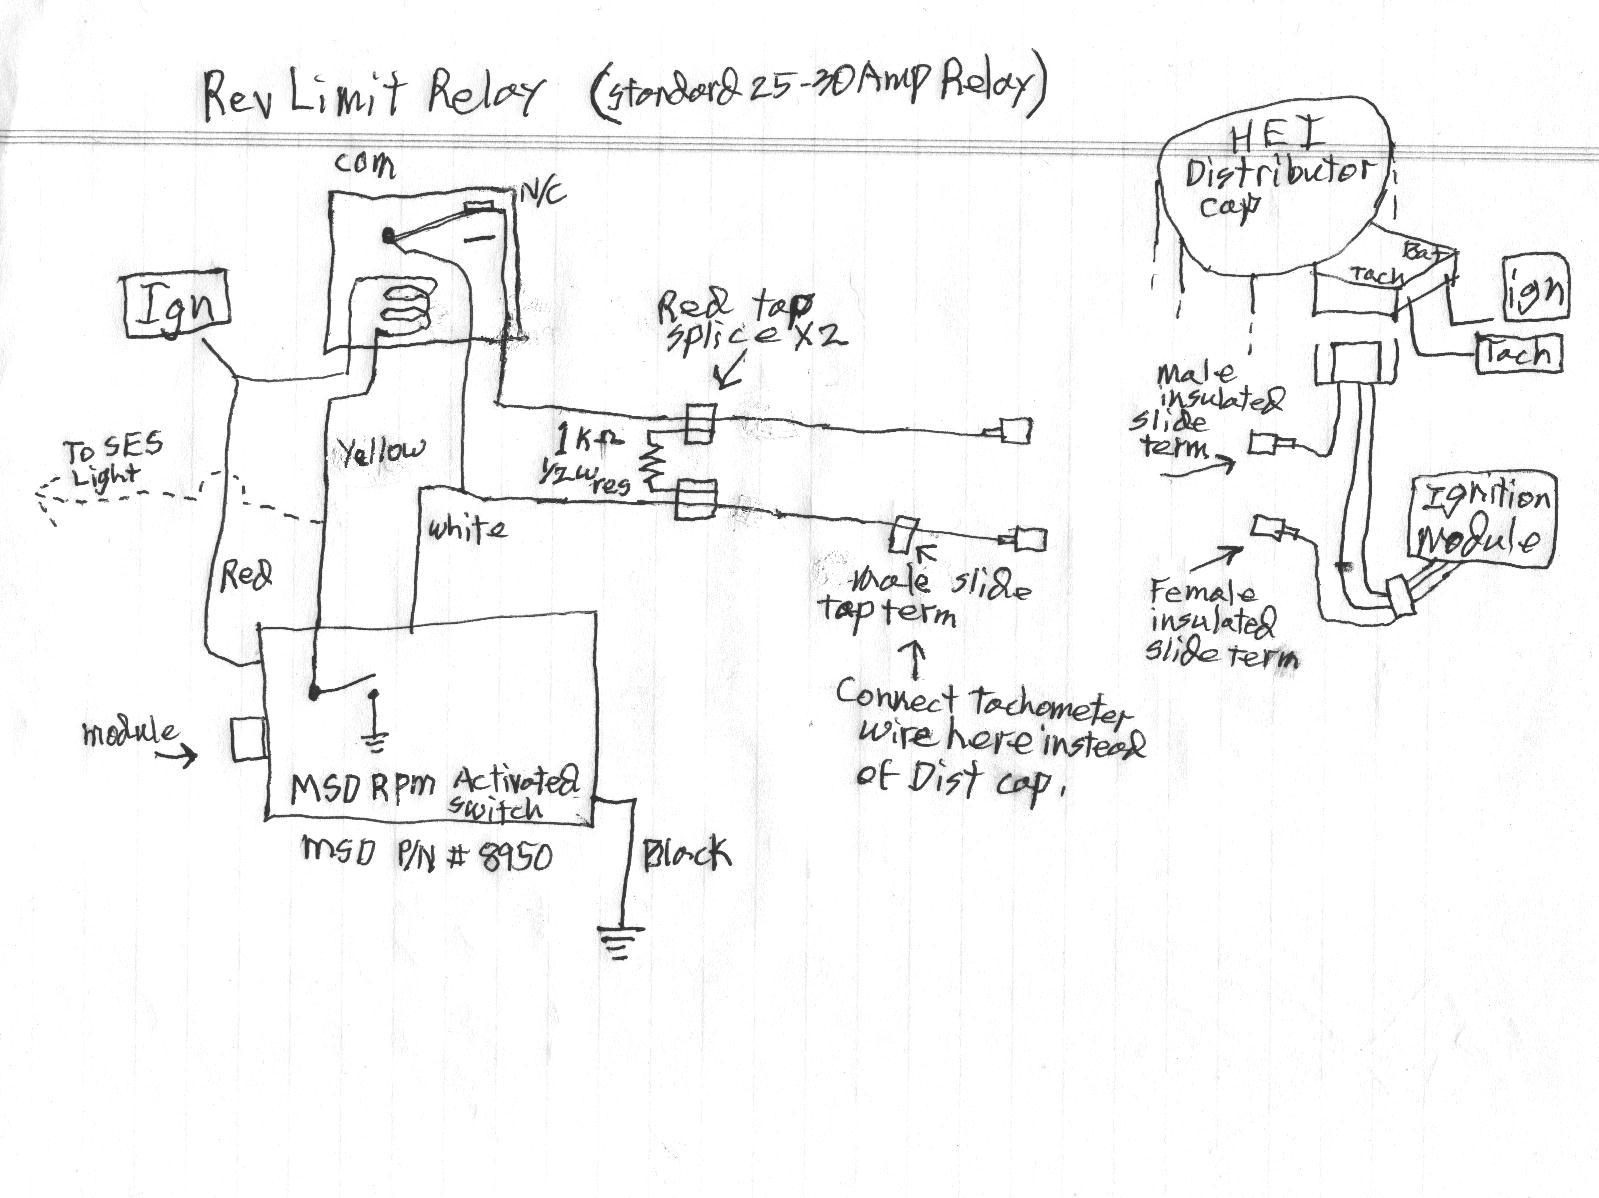 chevy 350 hei distributor wiring diagram wiring diagram Chevy 350 Wiring Diagram To Distributor chevy 350 distributor wiring diagram hei chevy 350 wiring diagram to distributor